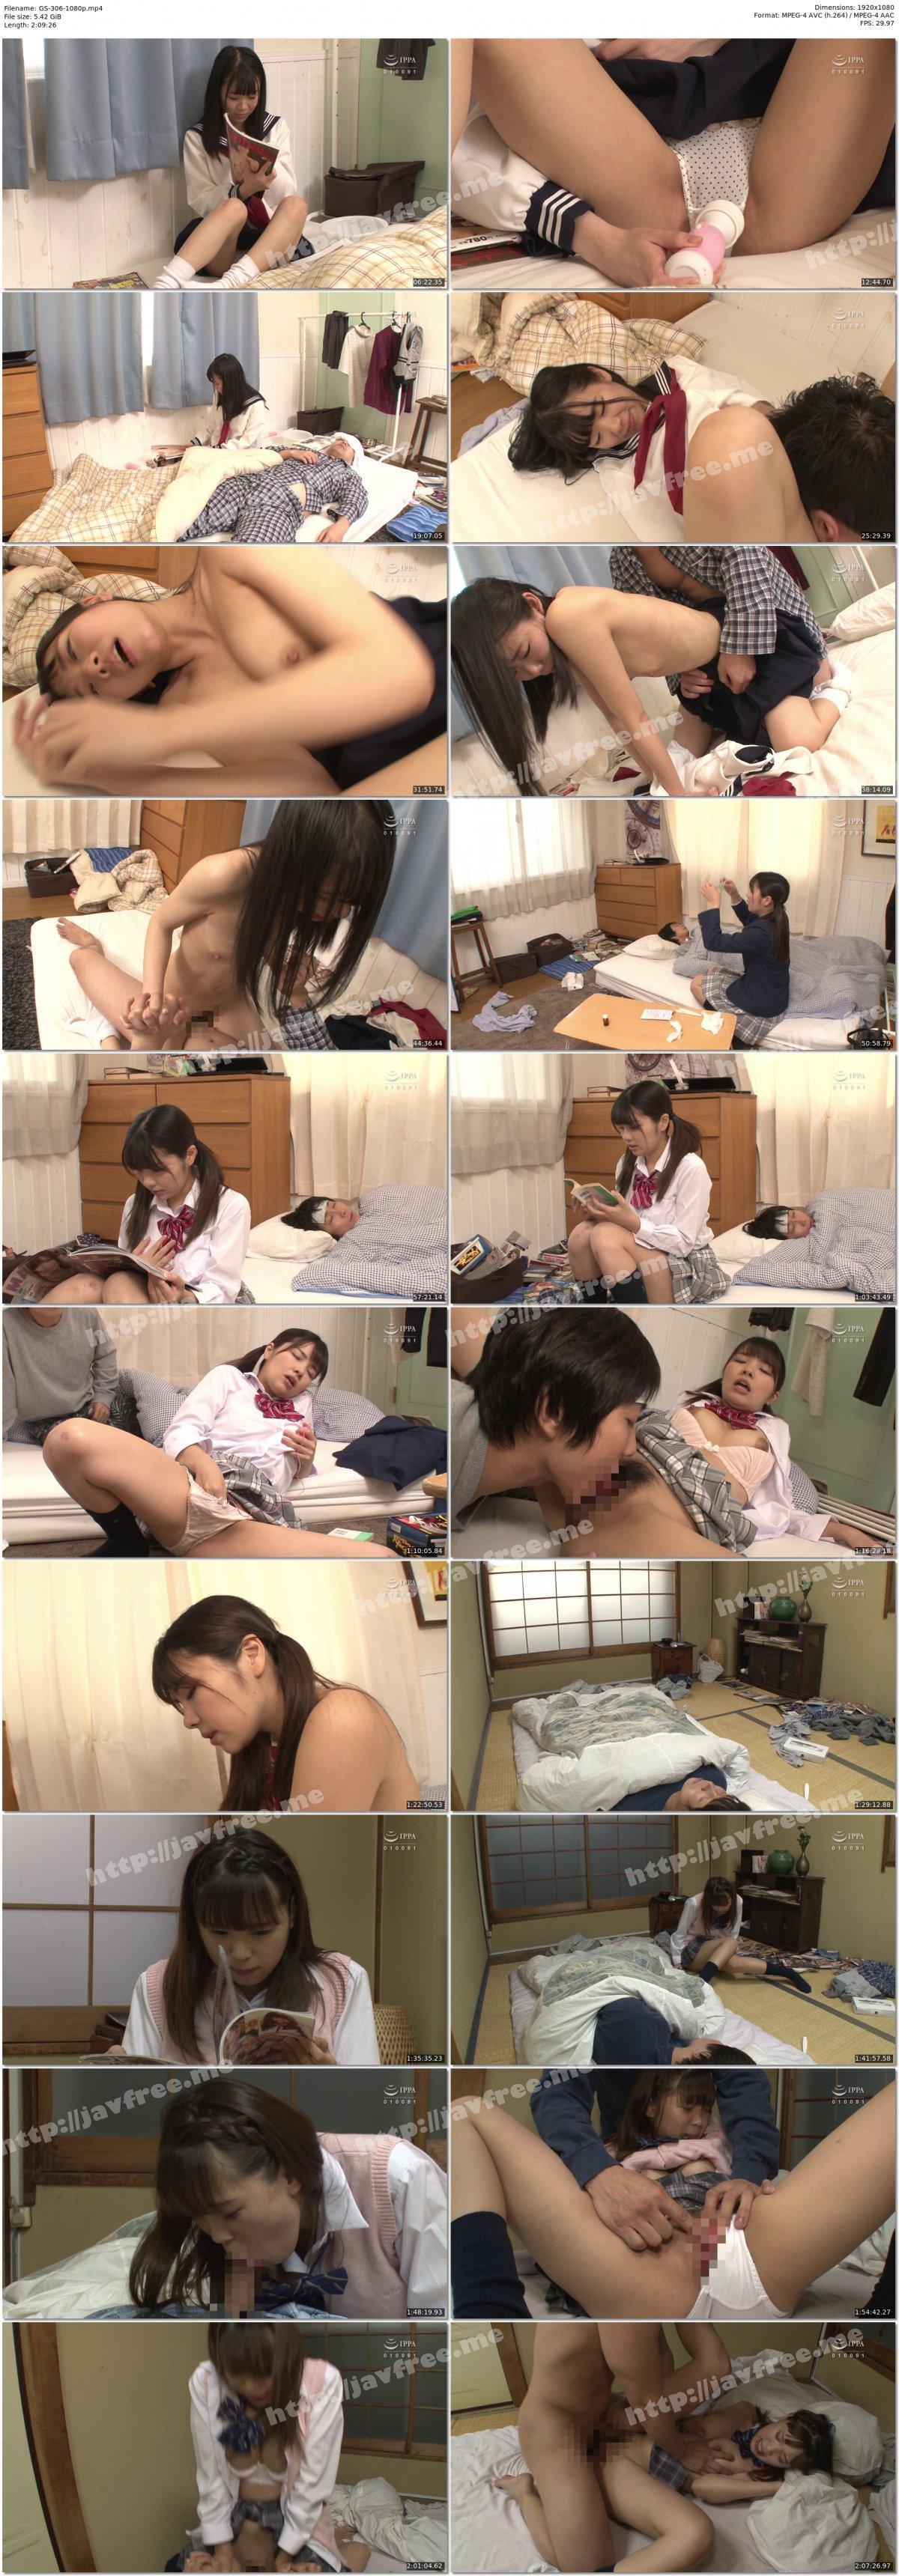 [HD][ZEAA-045] 兄嫁の母乳は飲み放題 羽月希 - image GS-306-1080p on https://javfree.me